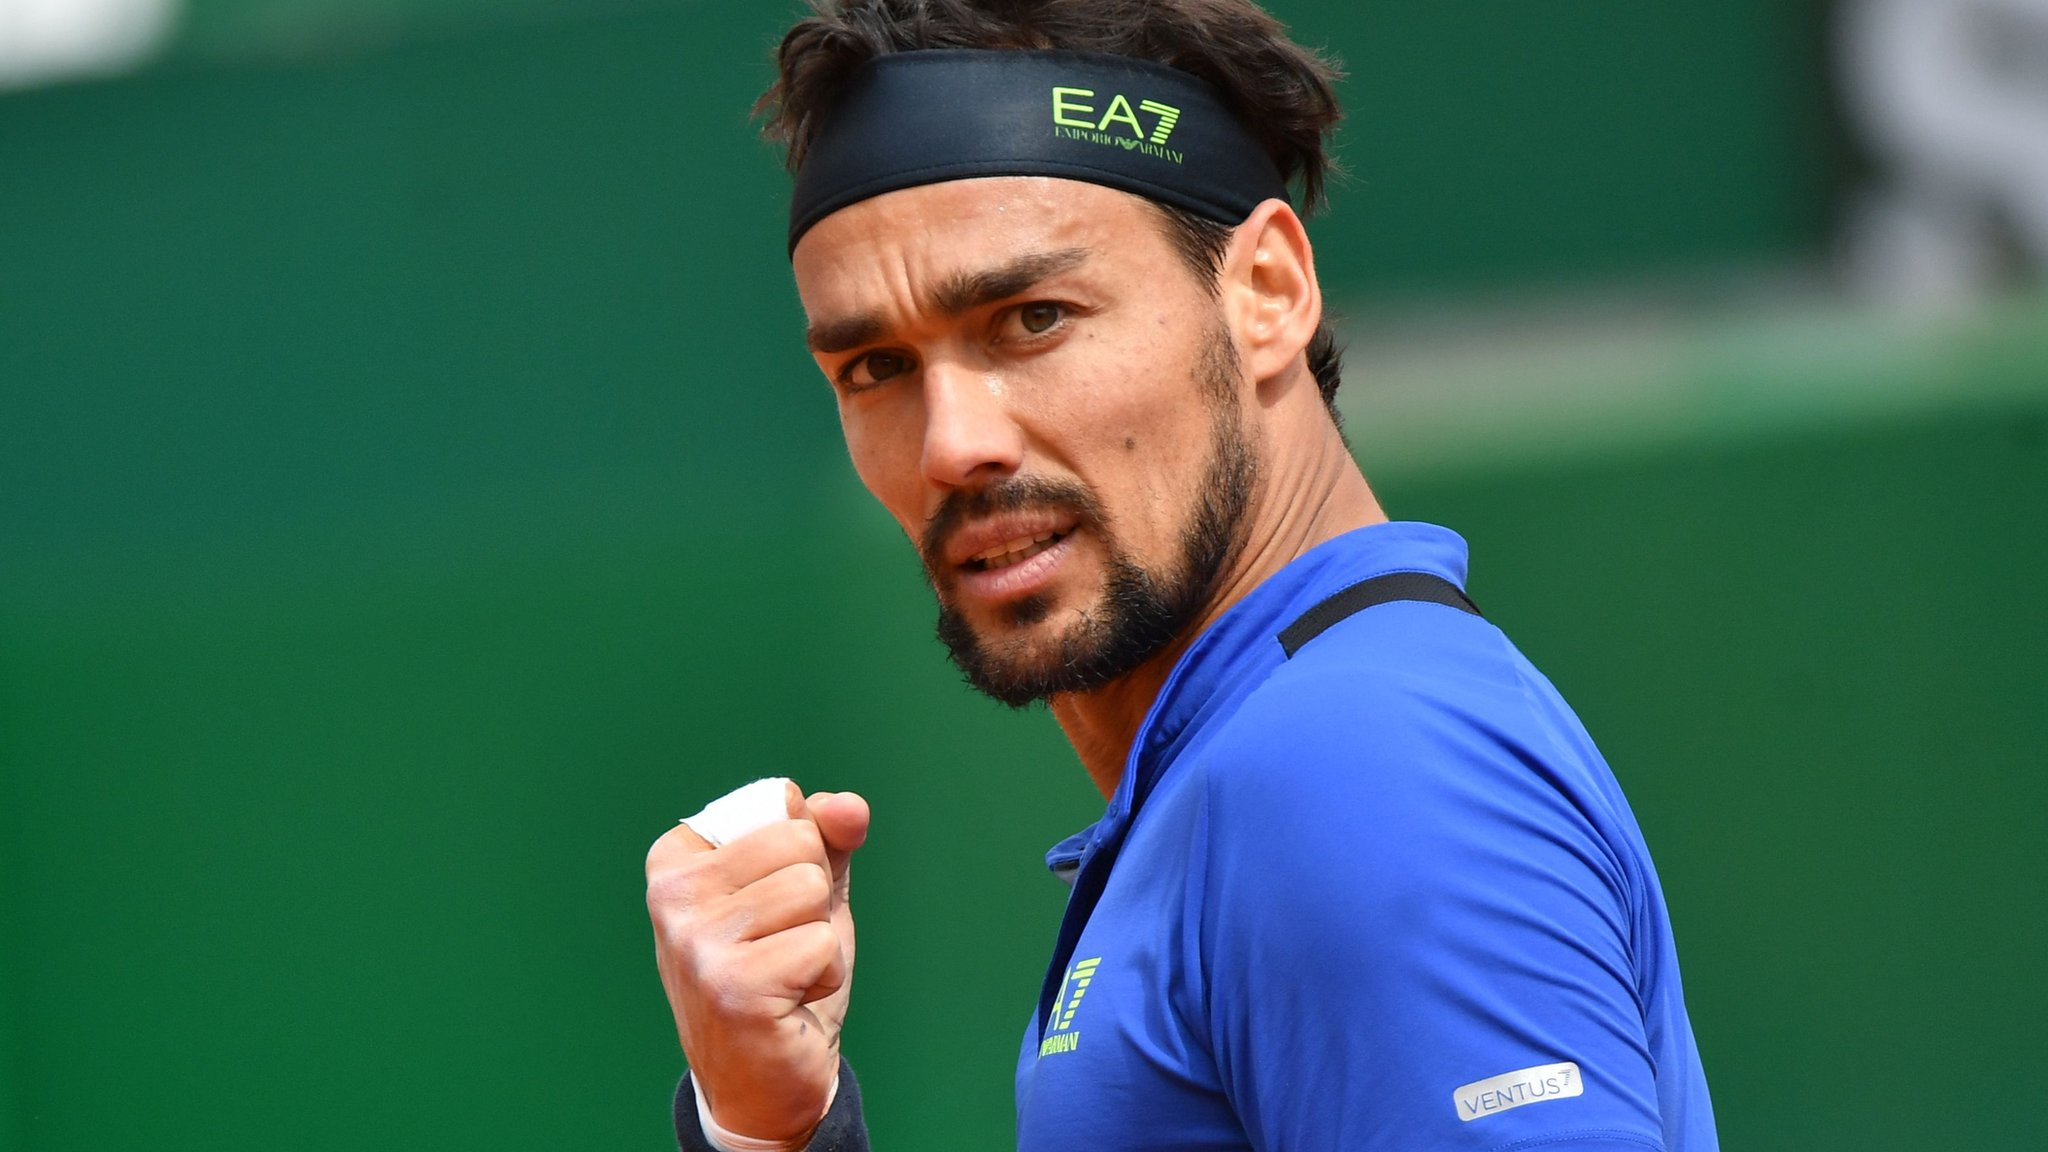 Monte Carlo Masters: Fabio Fognini beats Dusan Lajovic in final